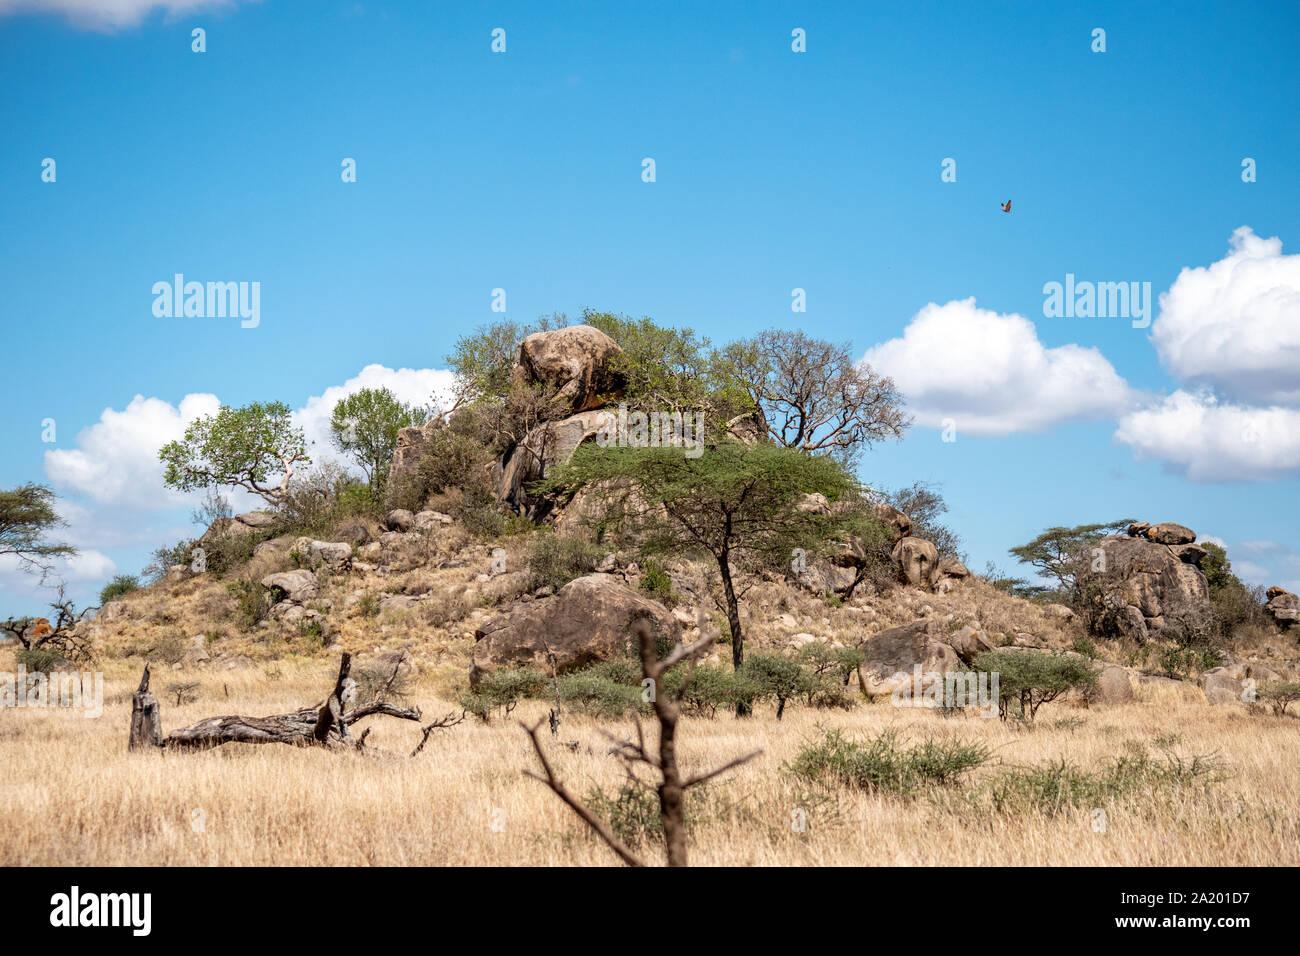 Serengeti landscapes with beautiful acacia trees. Stock Photo